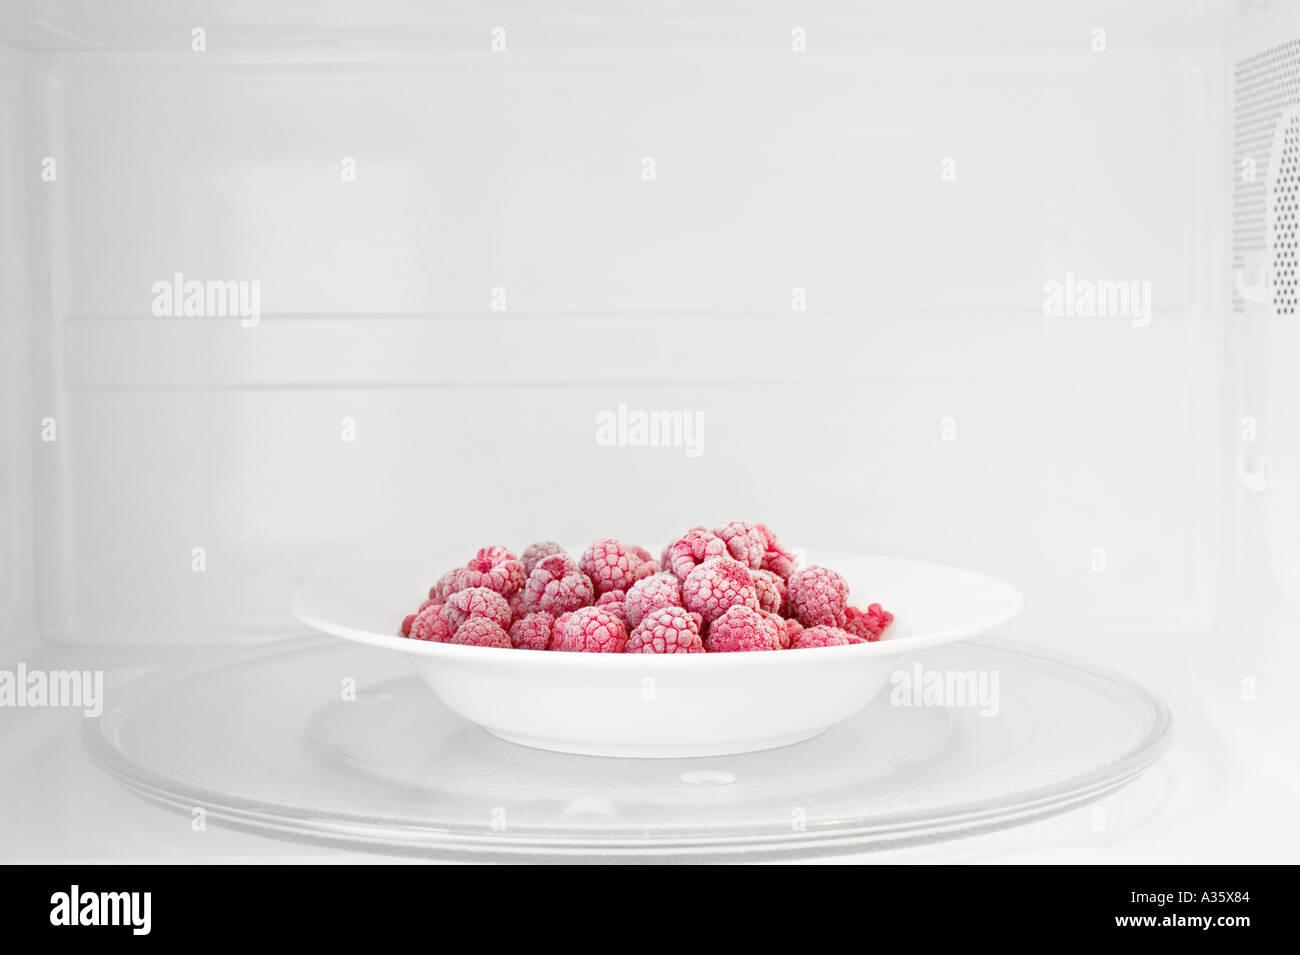 Plate Of Frozen Raspberries In Microwave Oven - Stock Image